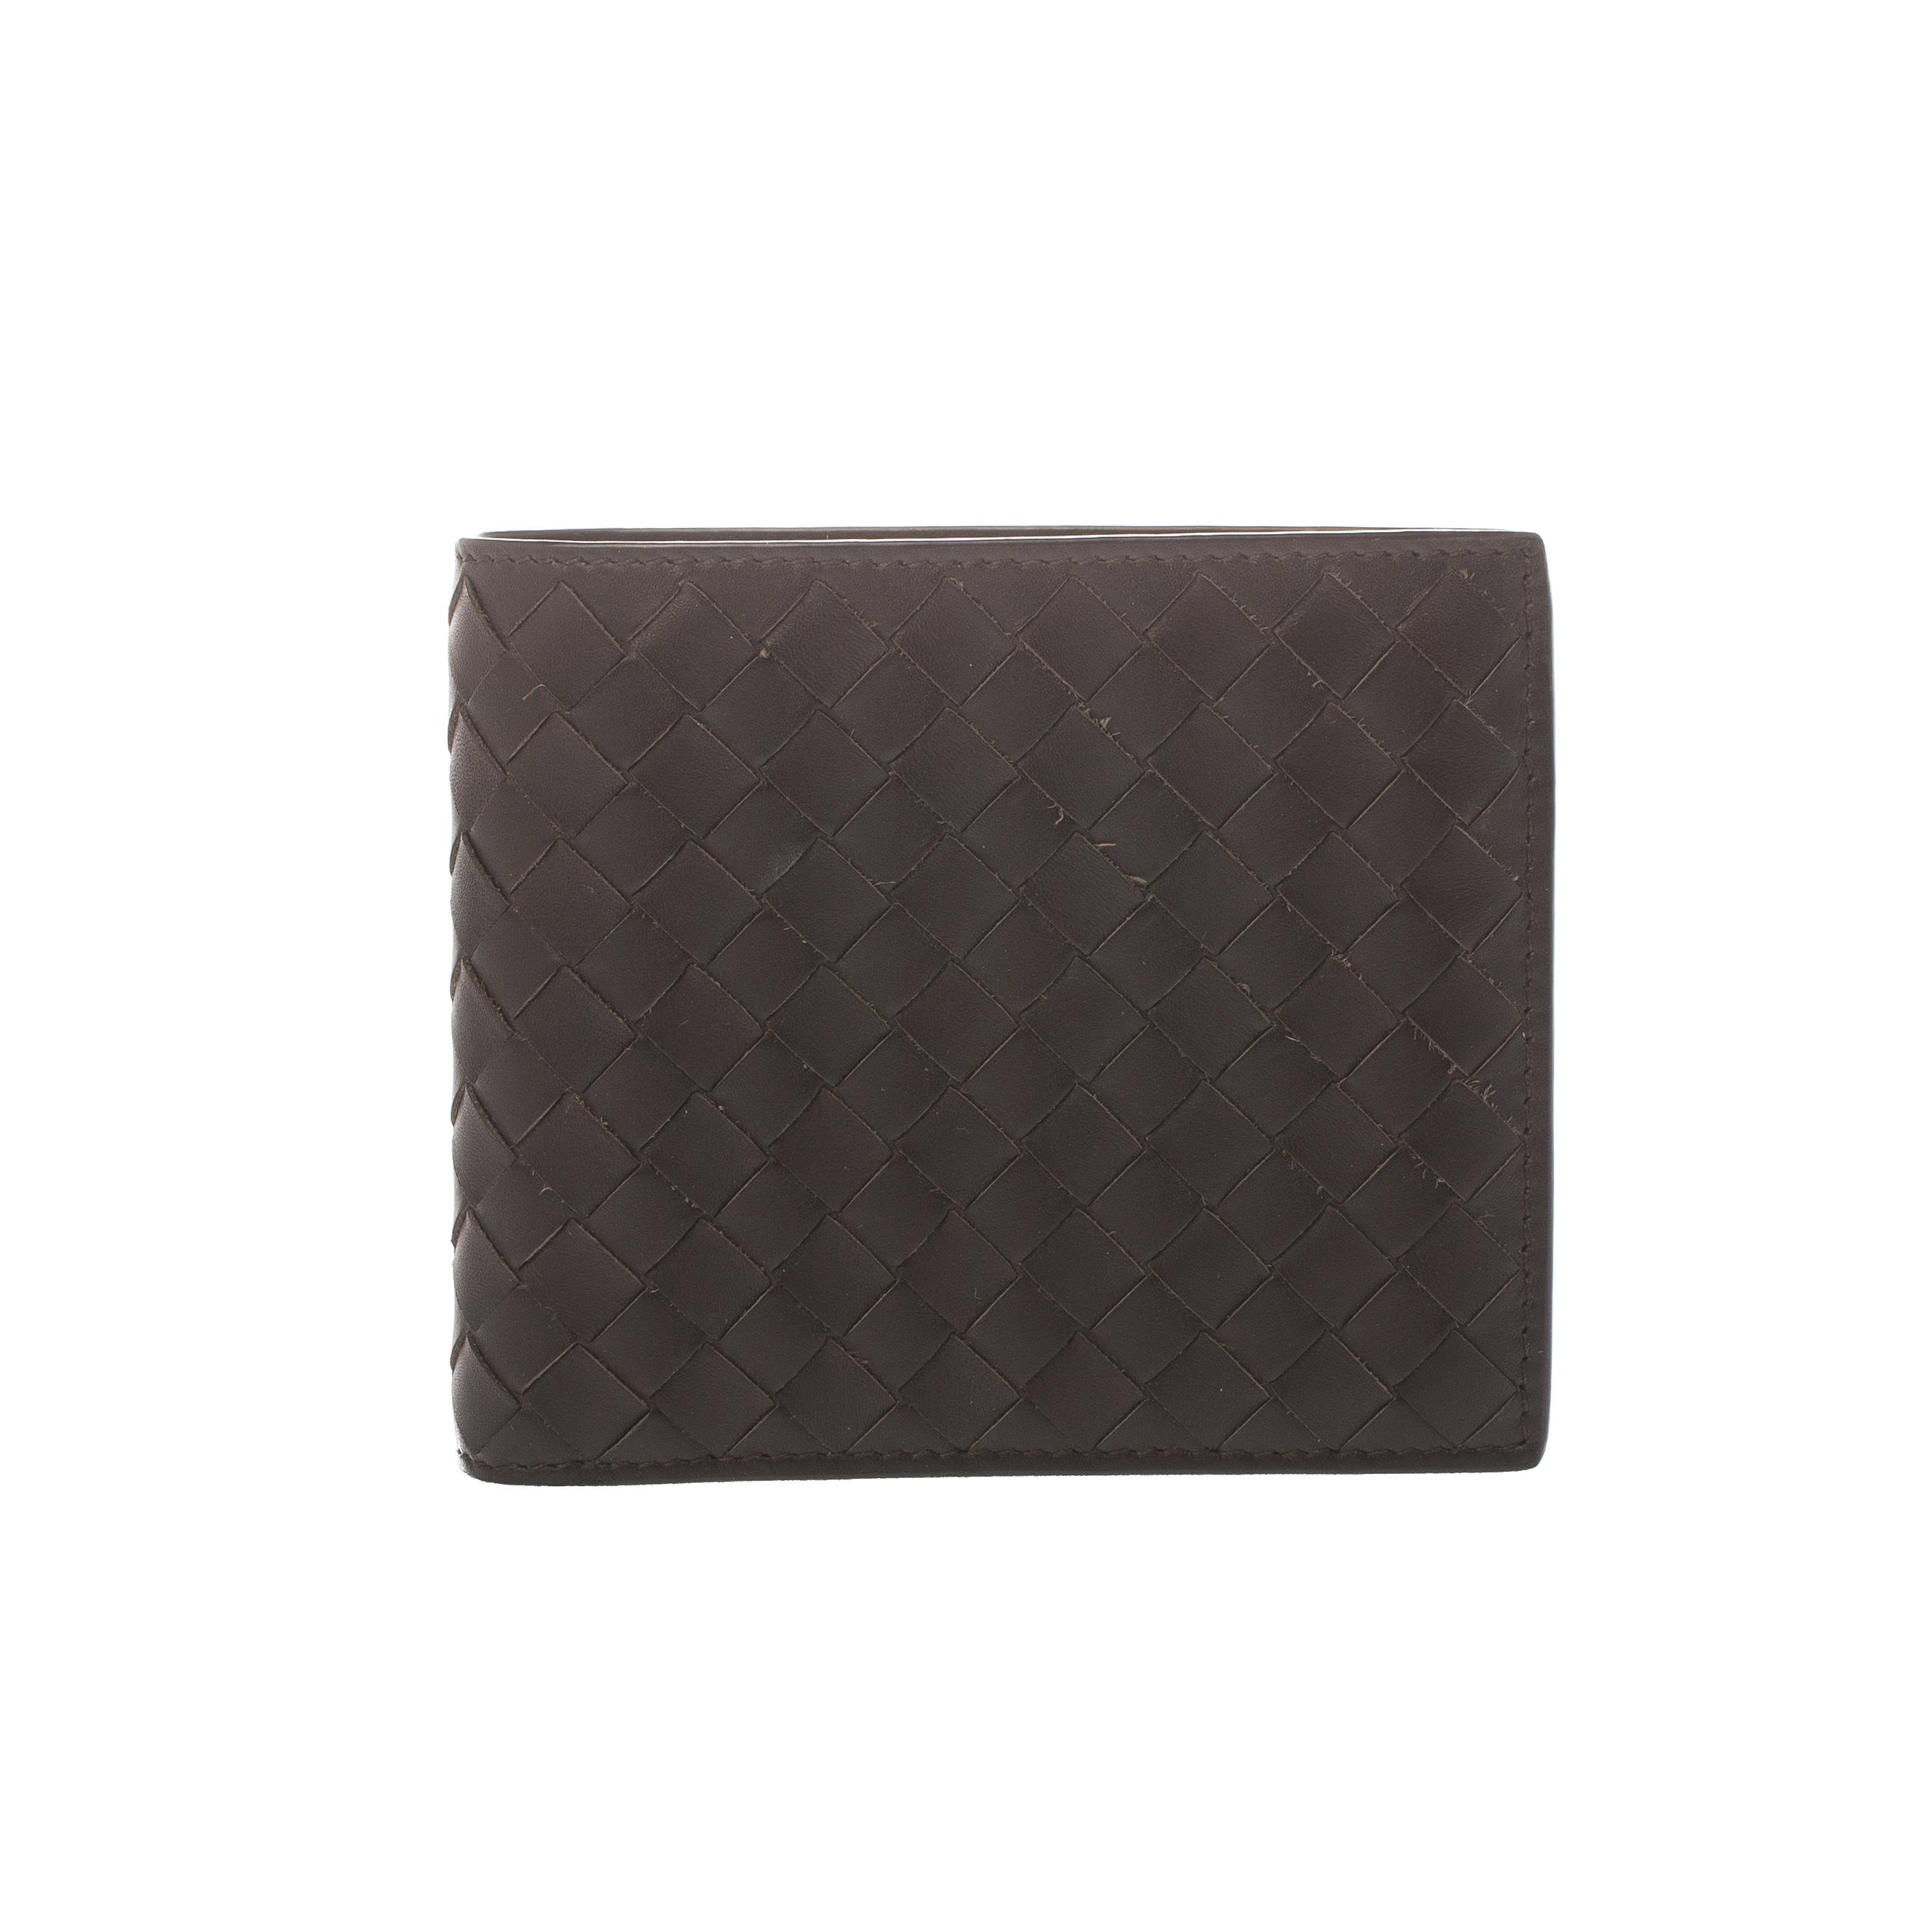 187abb1337 Bottega Veneta Dark Brown Intrecciato Leather Bifold Wallet